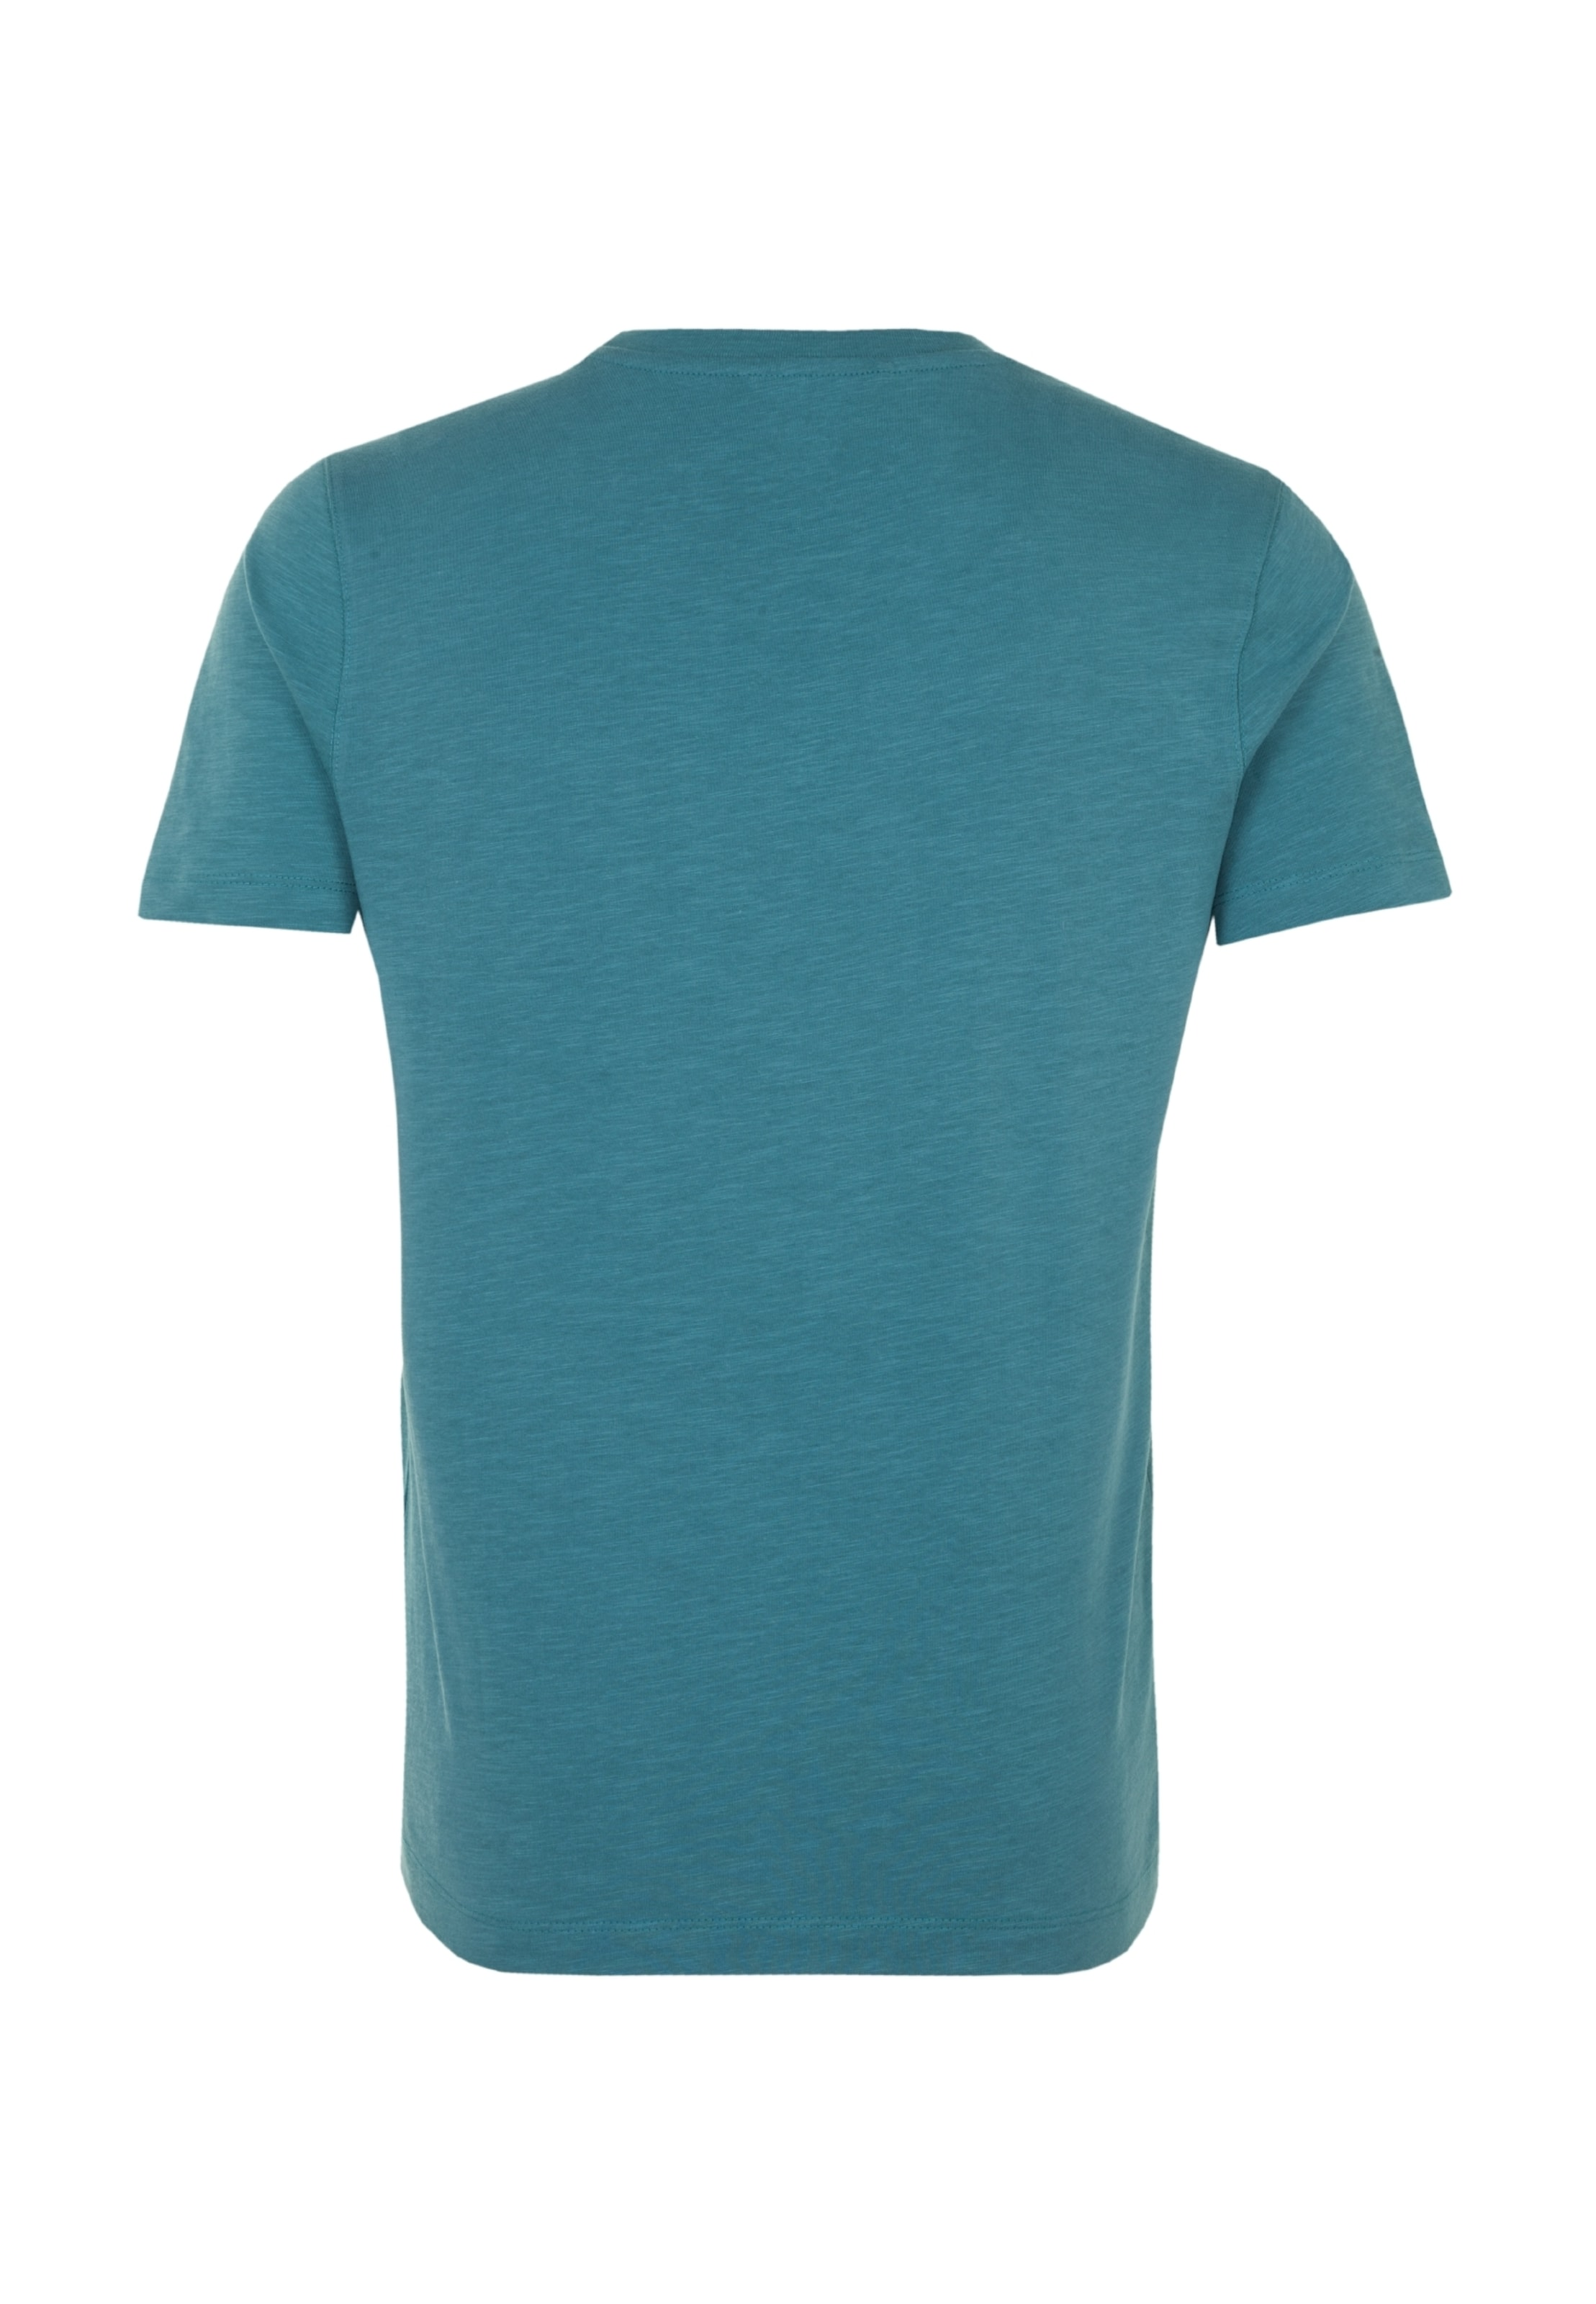 Active T Camel PastelGris shirt En Foncé Blanc Bleu kO80nwPNXZ